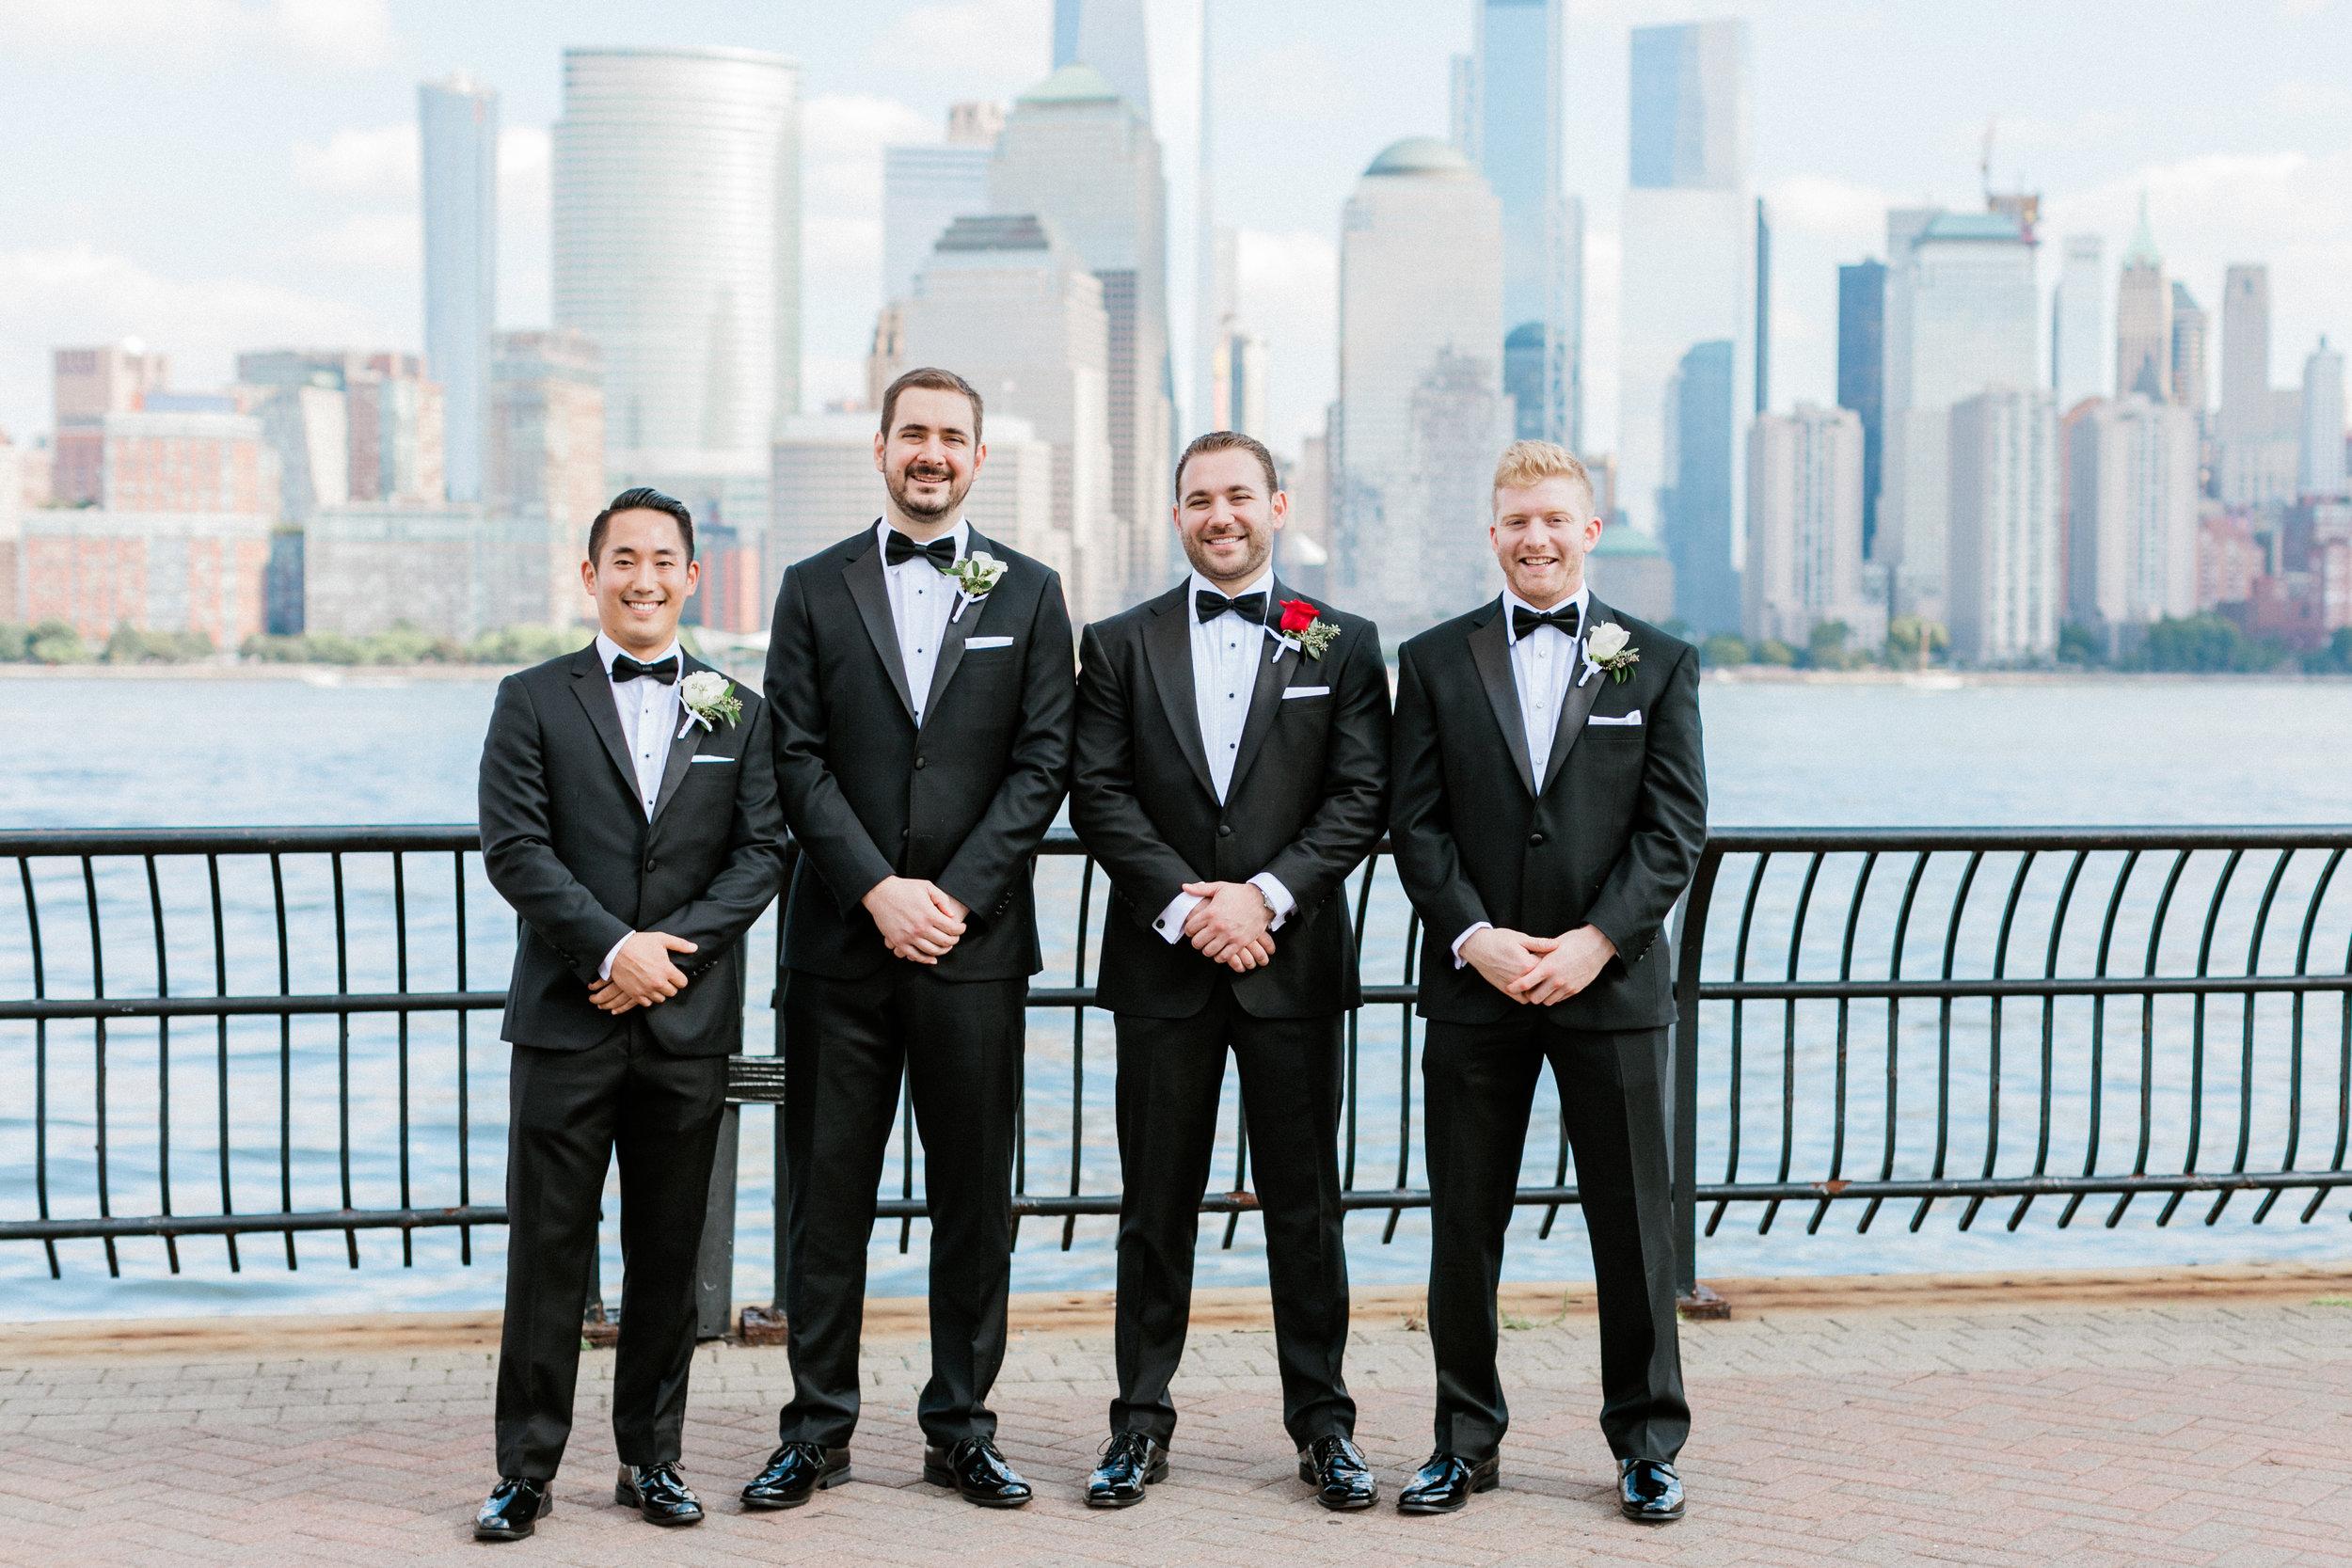 hyatt-regency-jersey-city-wedding-photographer29.jpg